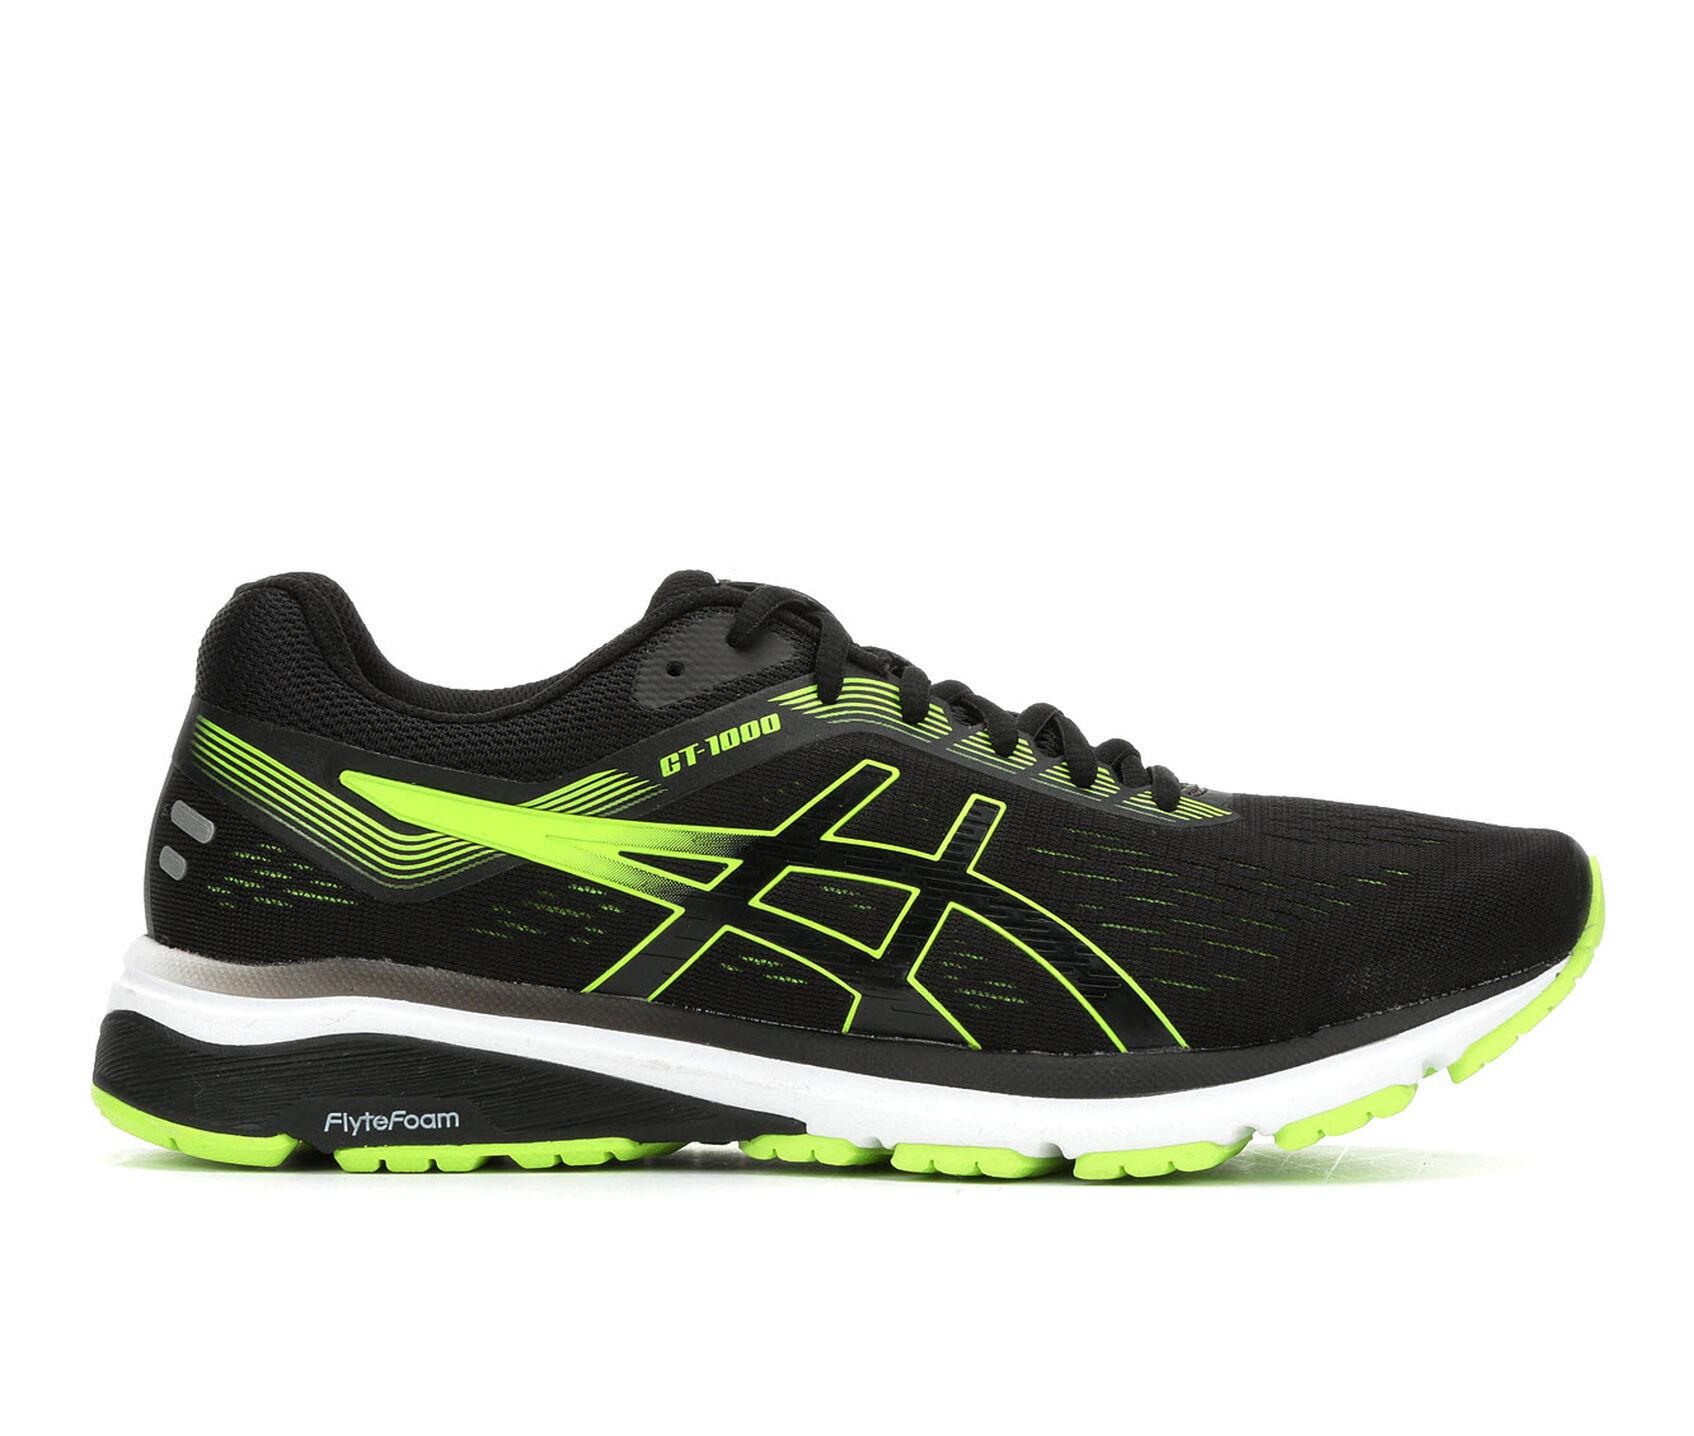 huge discount 636a2 7192c Men's ASICS GT 1000 7 Running Shoes